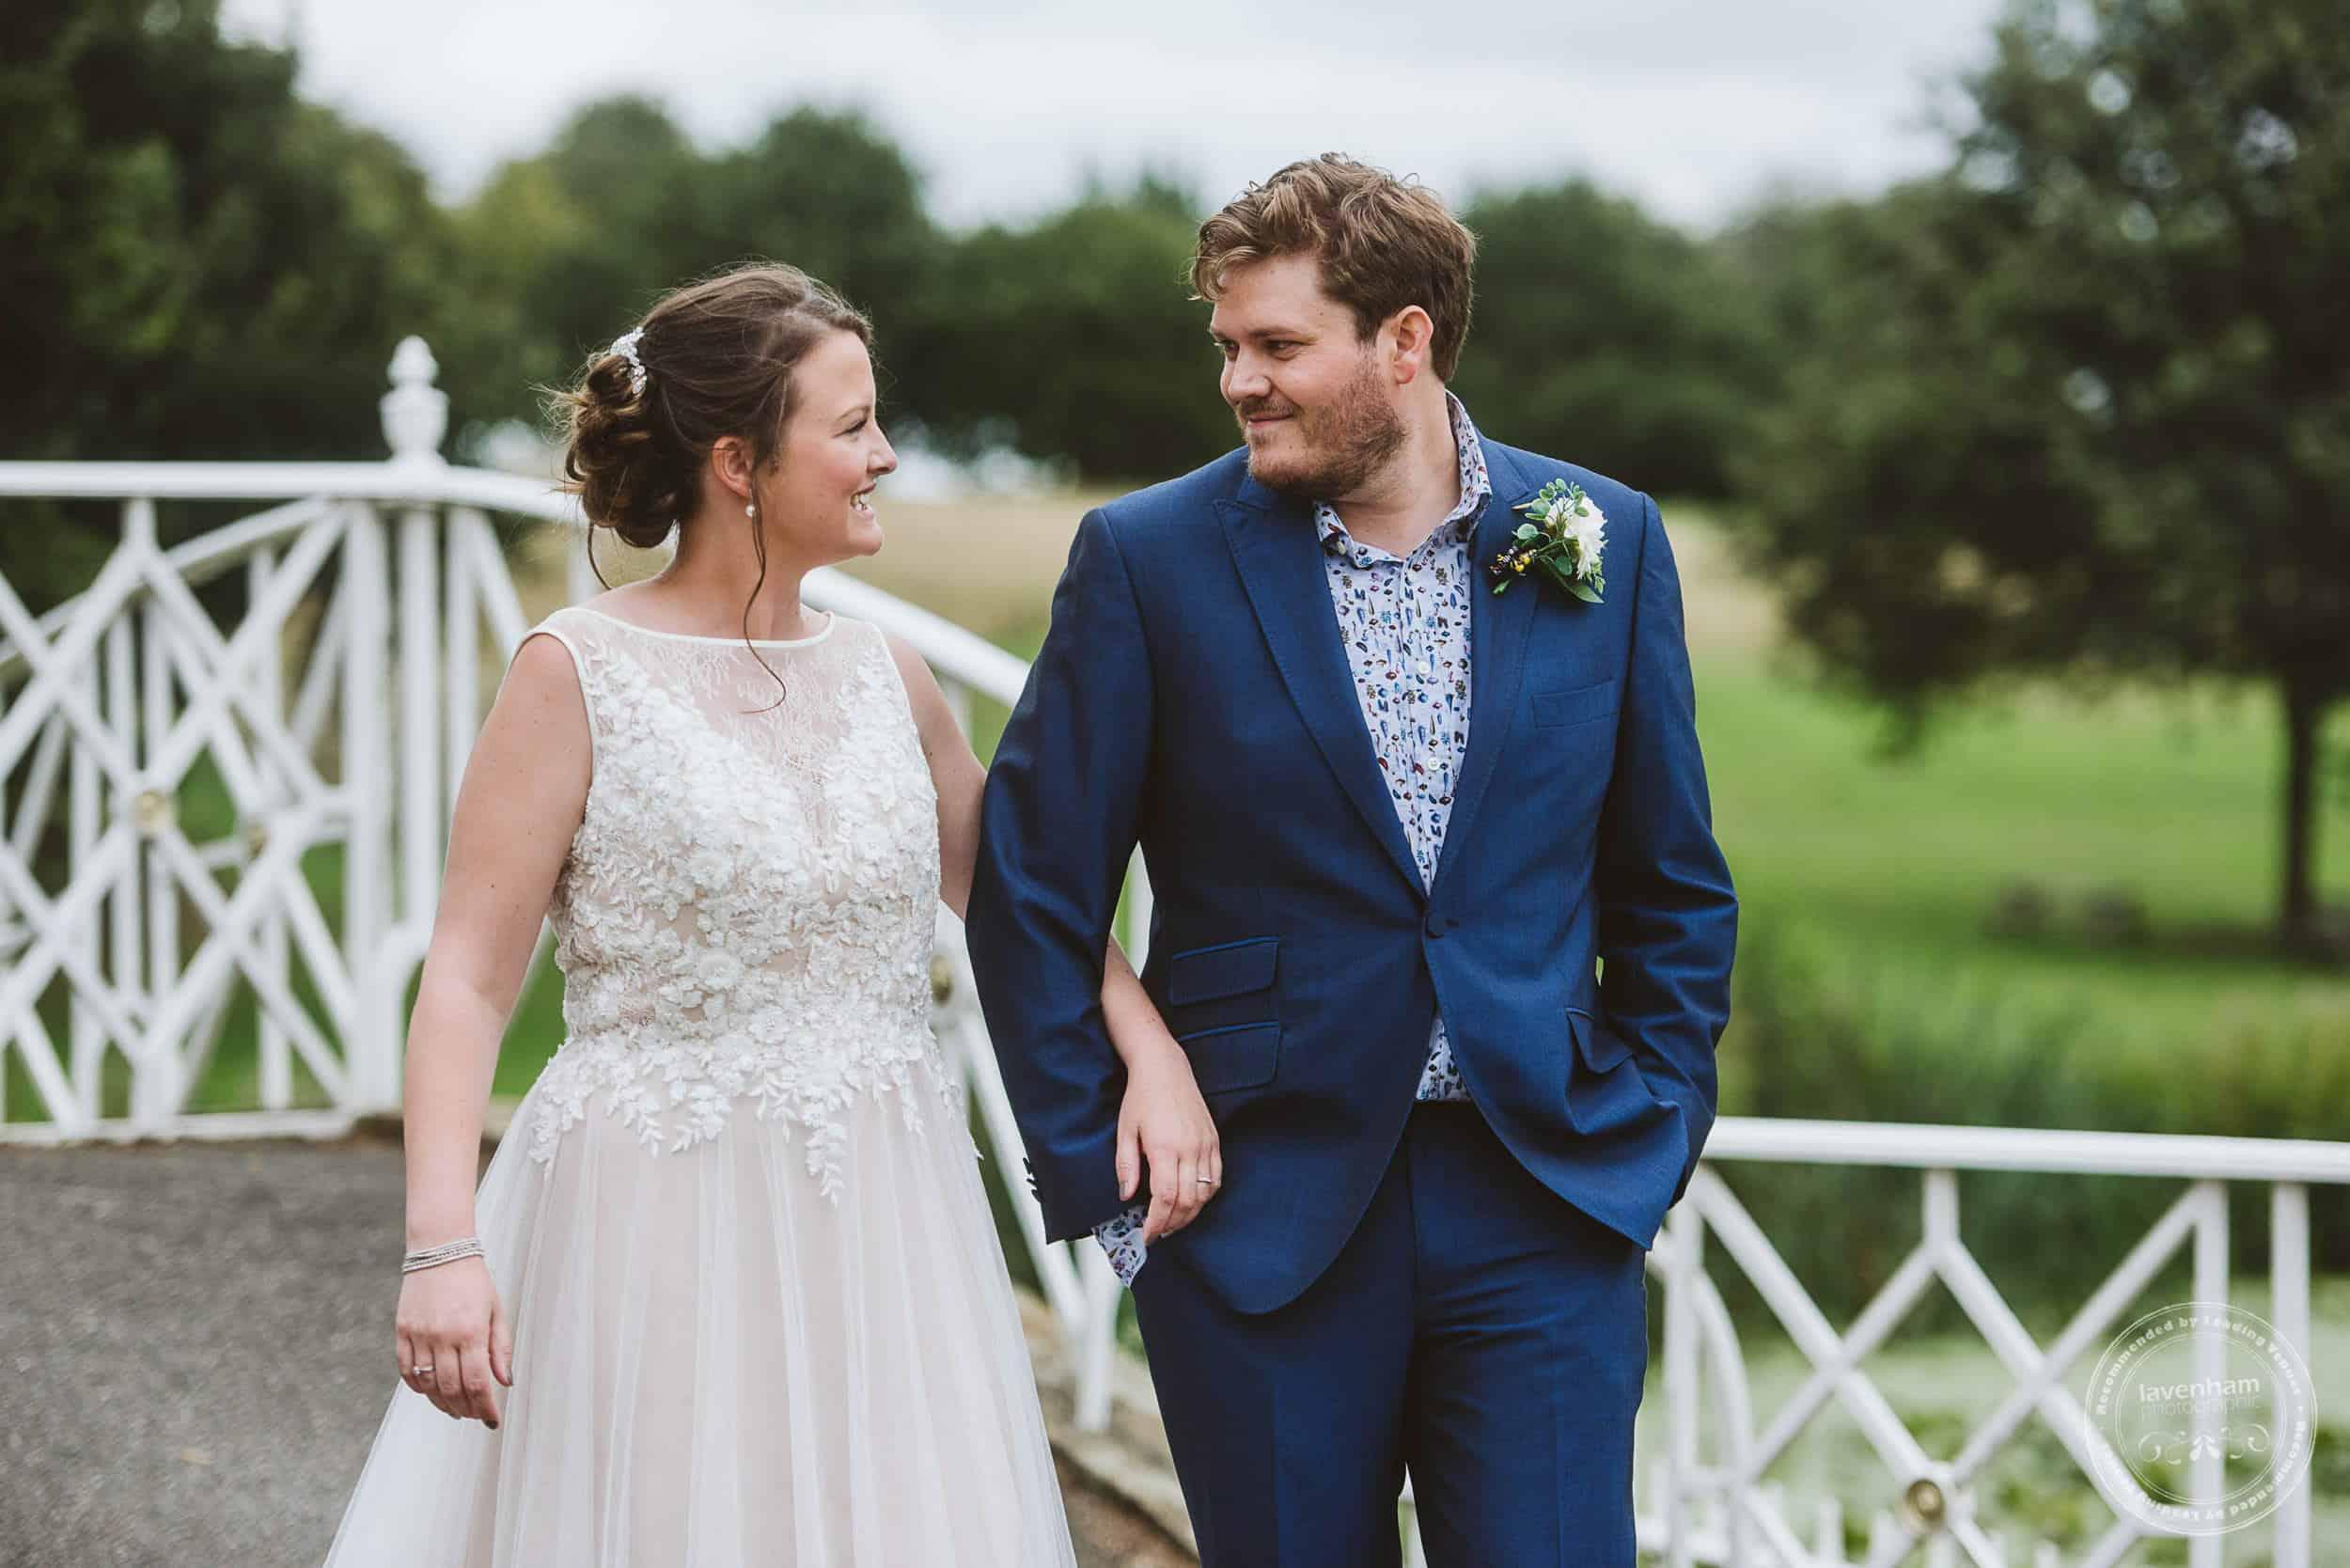 180818 Marks Hall Wedding Photography Lavenham Photographic 099